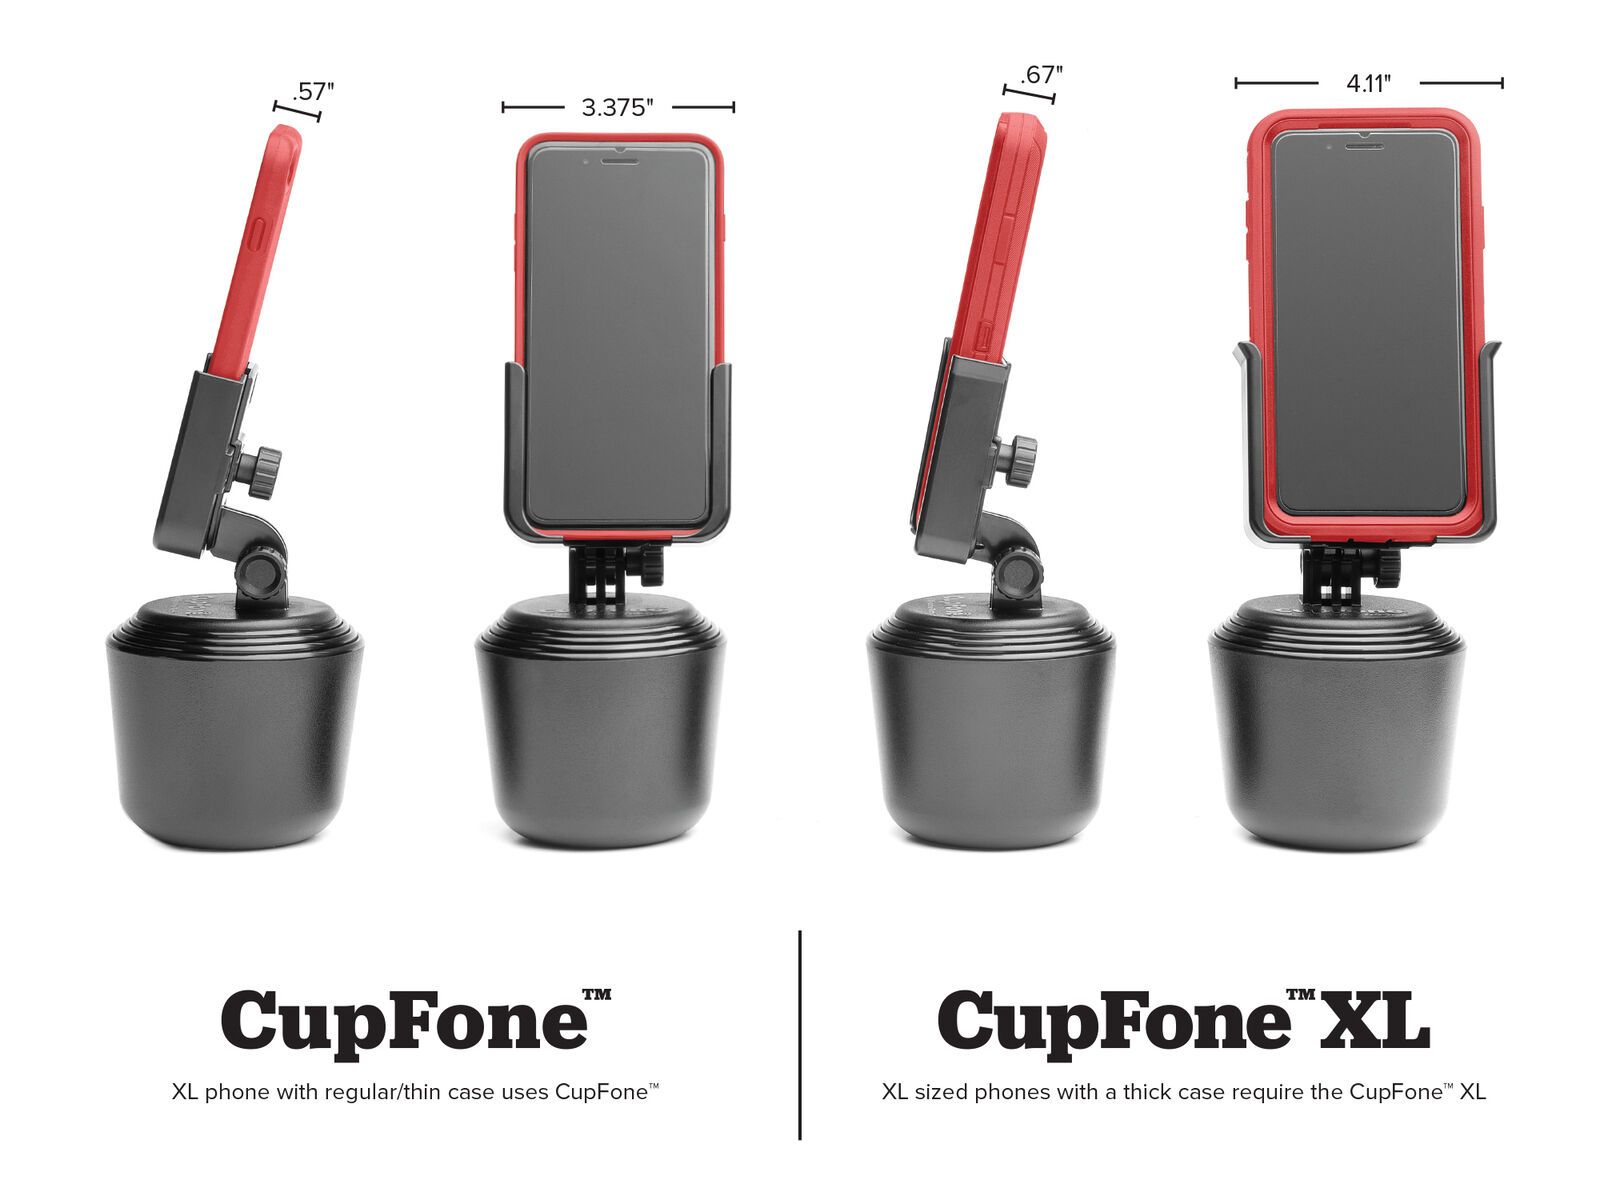 Weathertech Cupfone Universal Adjustable Cup Holder Car Mount 8acf1 Black For Sale Online Ebay